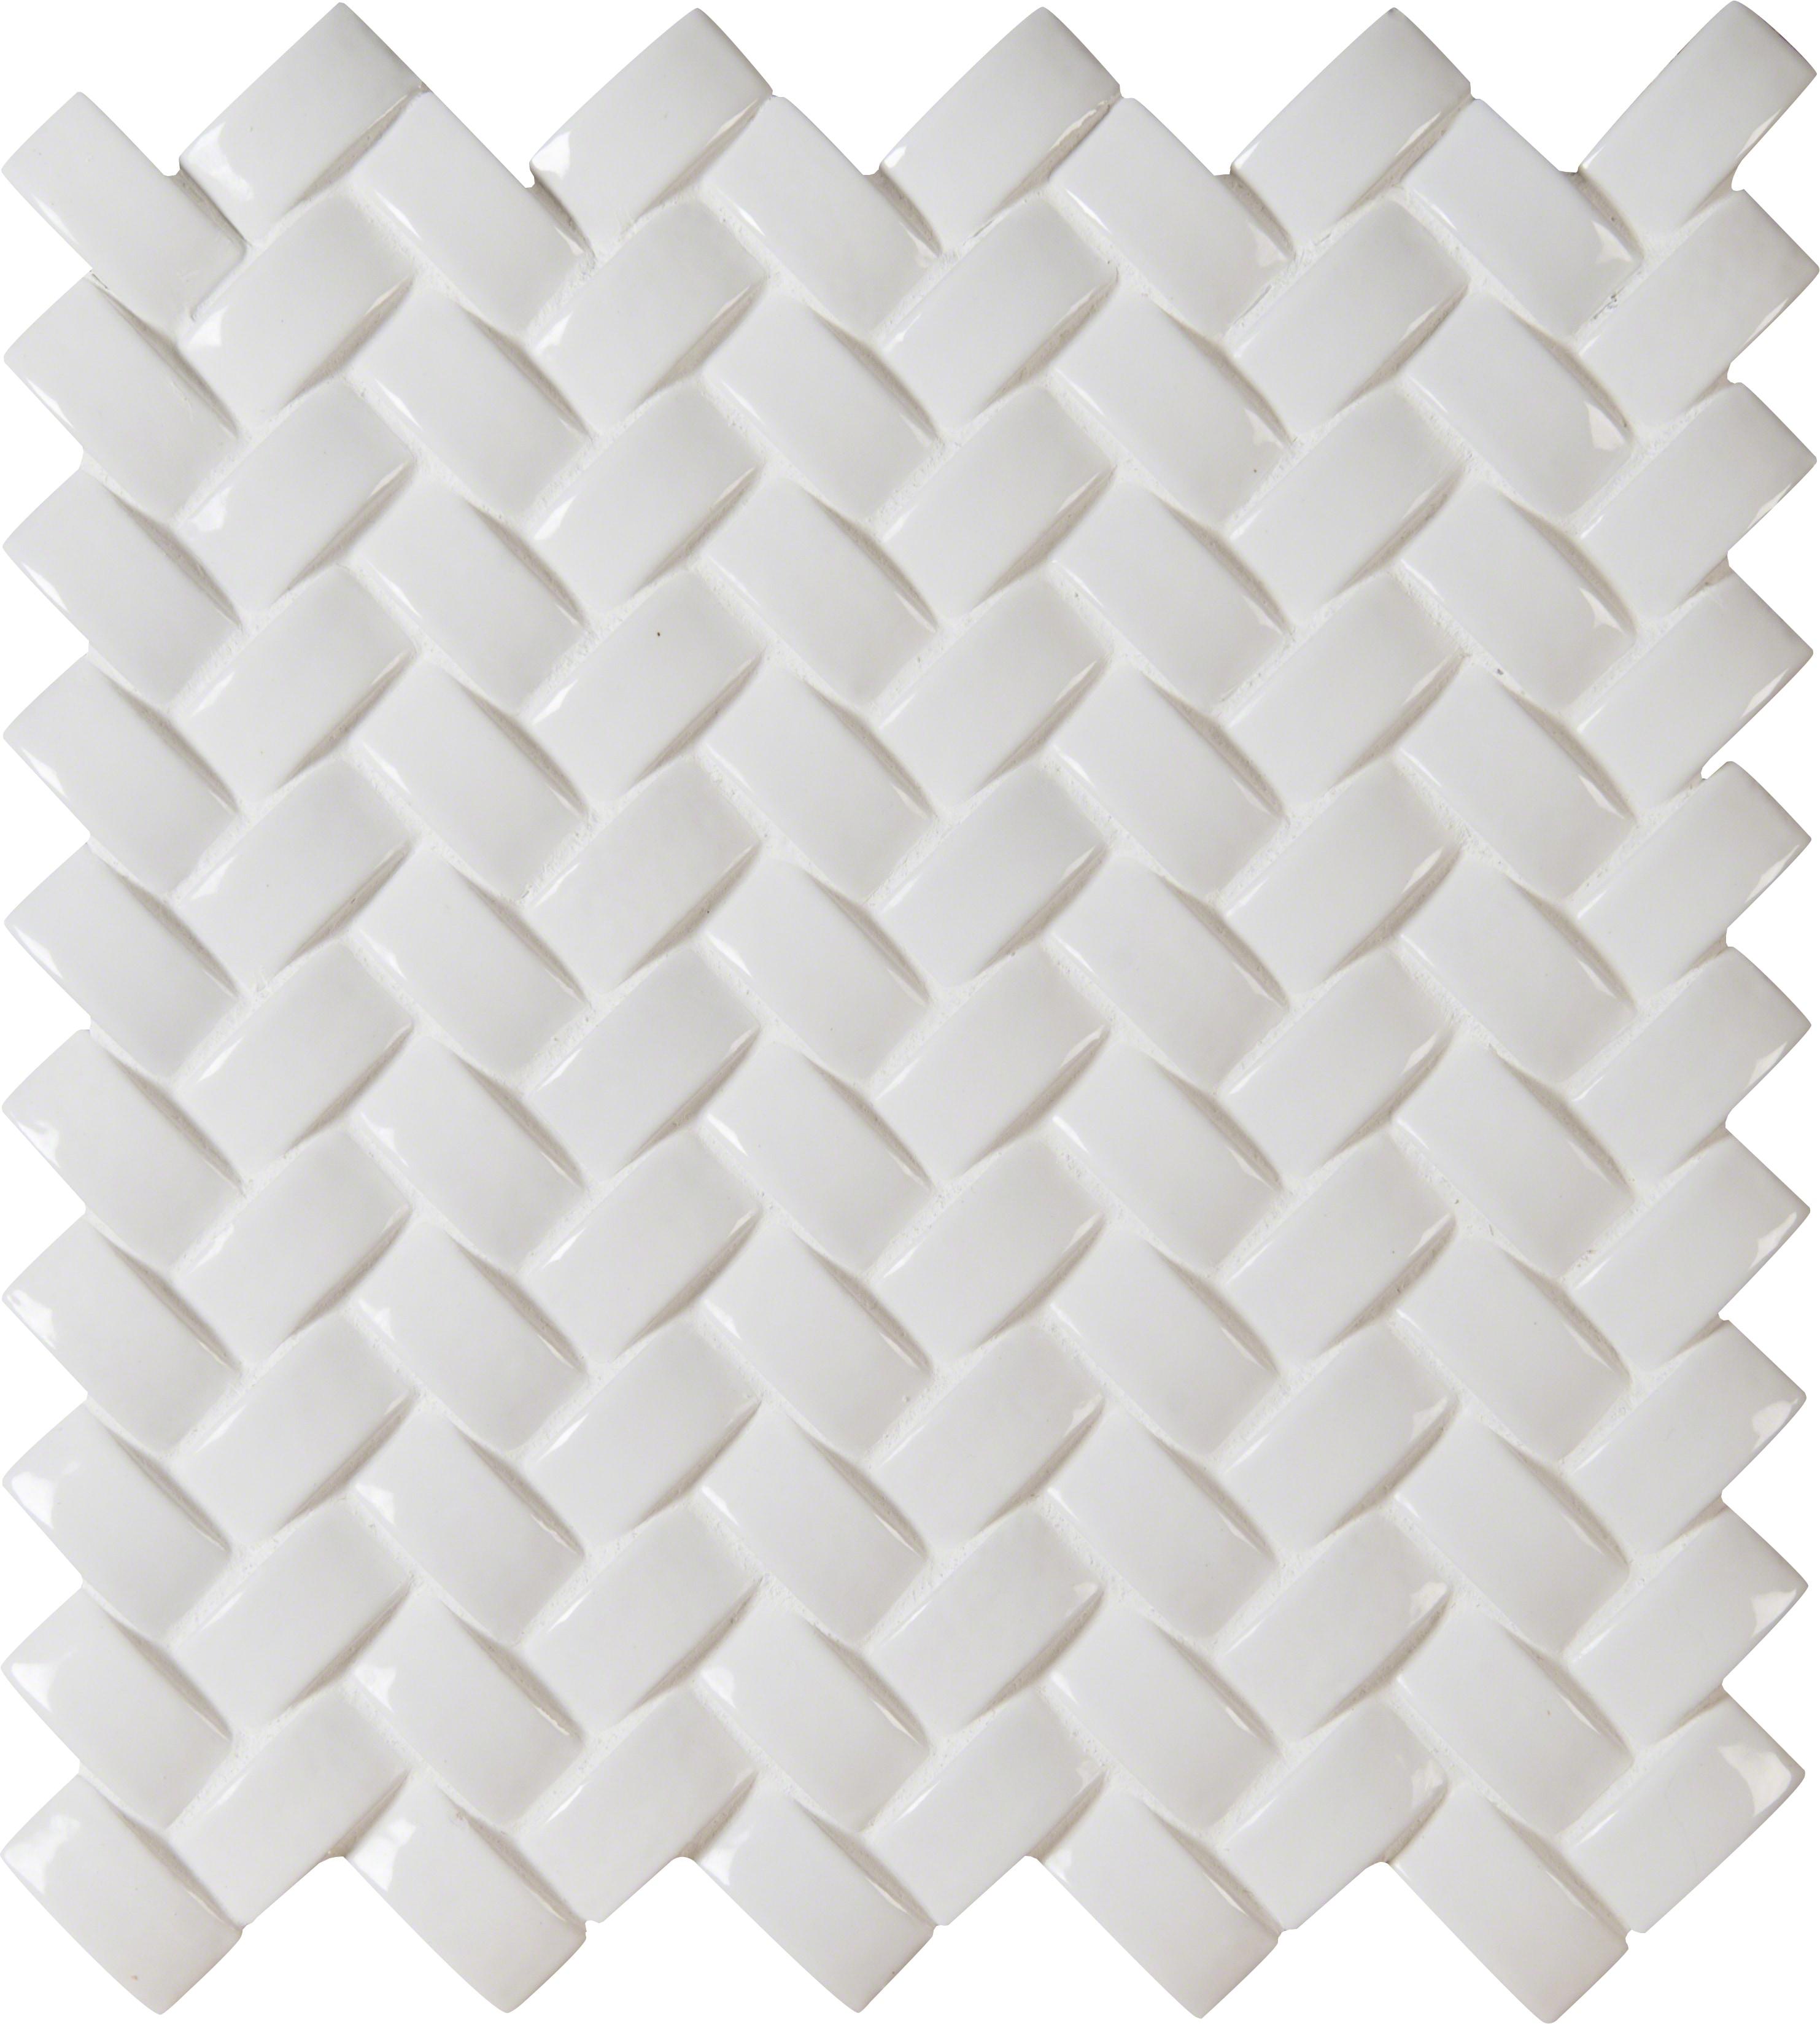 Arched Herringbone 8mm / Pattern / Glossy Ceramic Tile - Whisper White 0